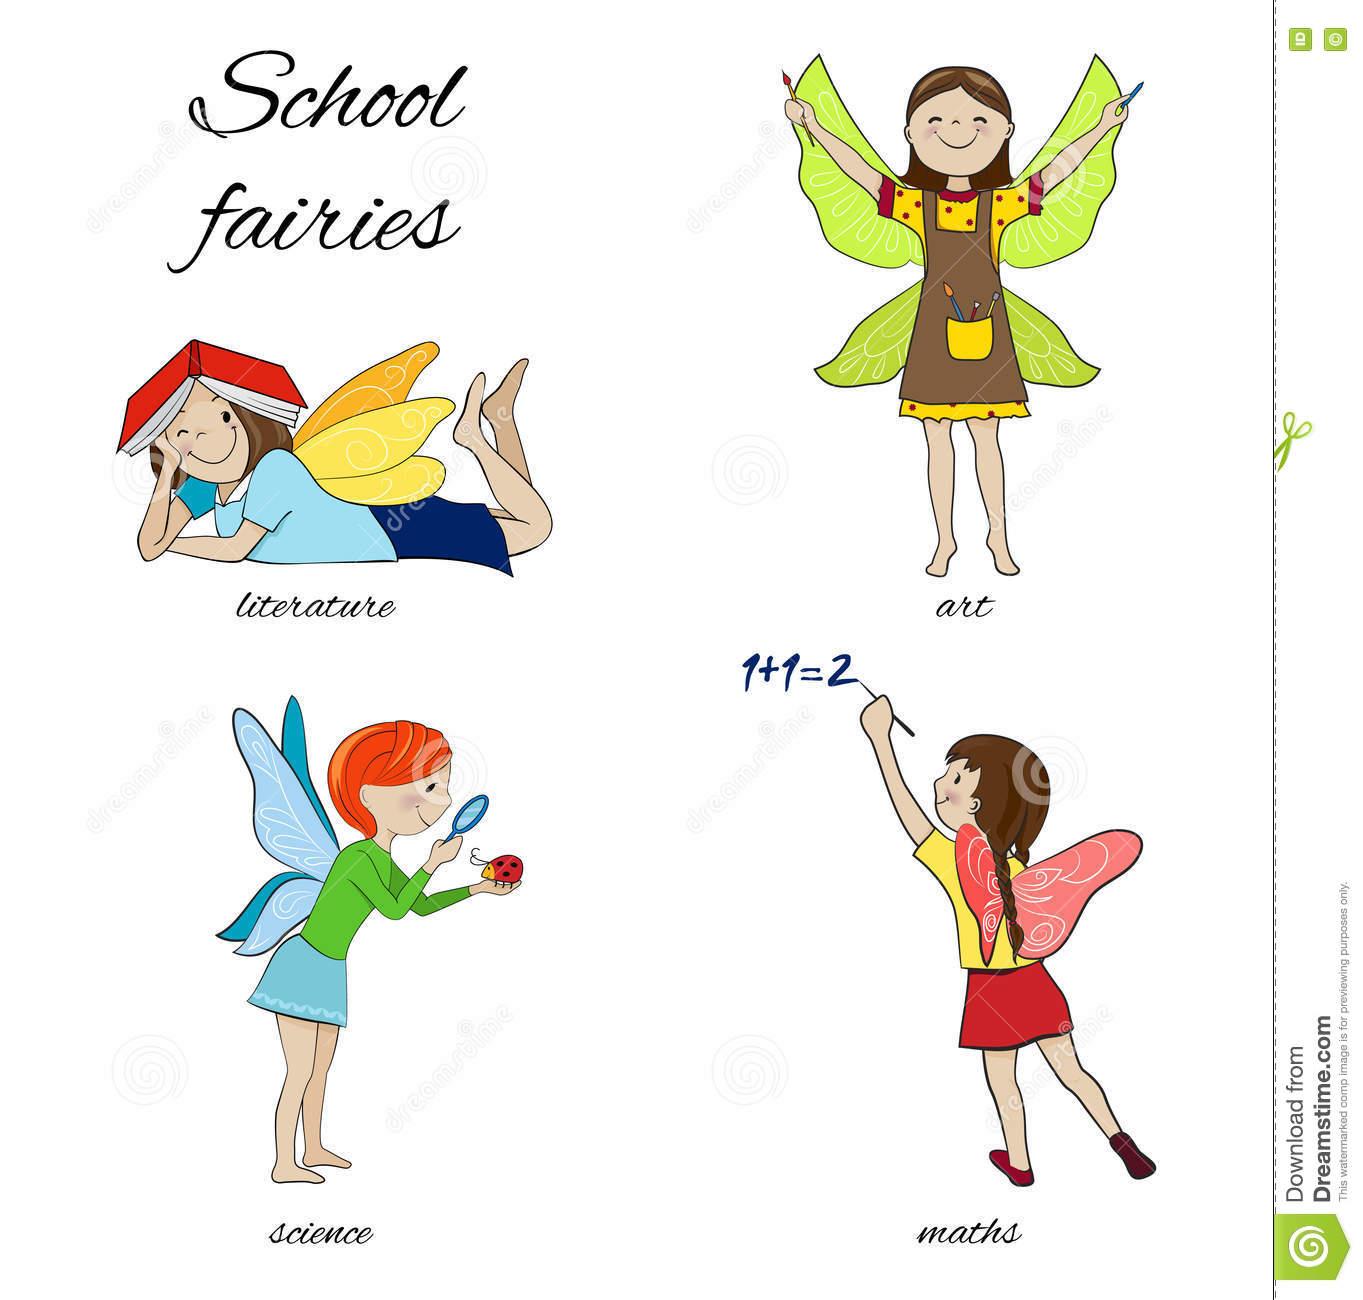 School Fairies Cartoon Vector Illustration Stock Vector.